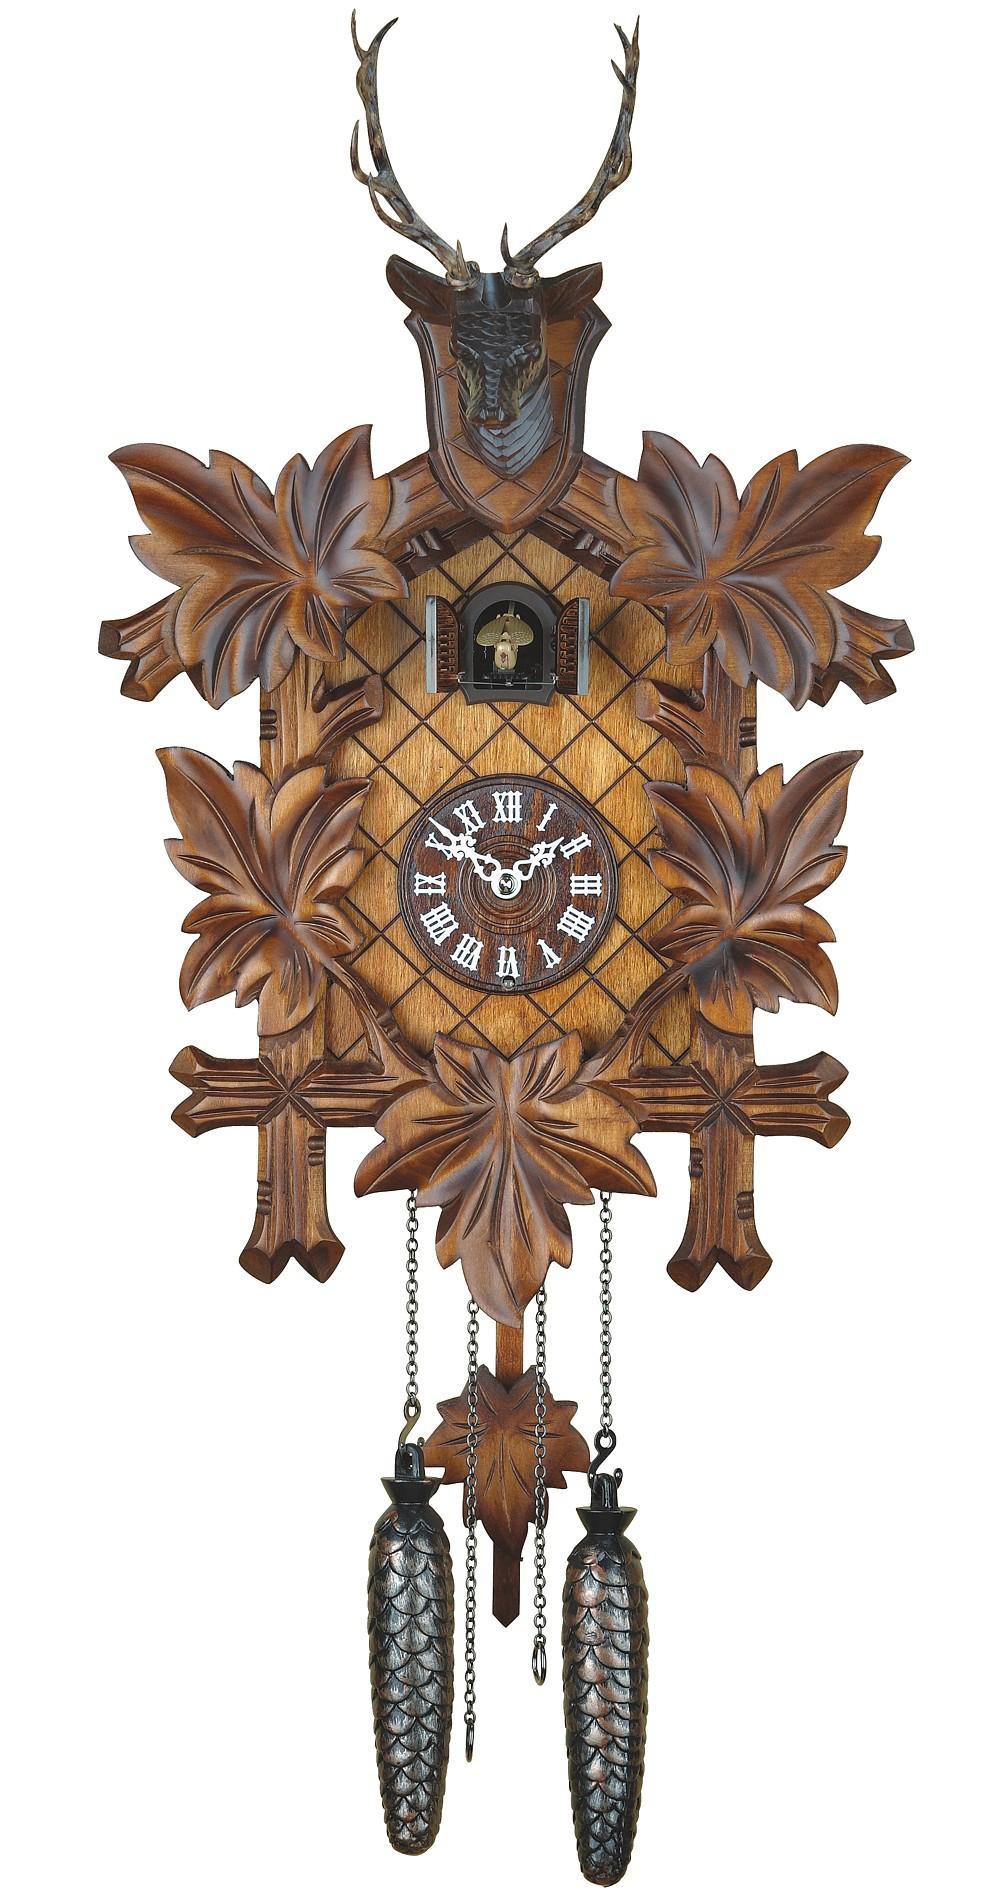 hunting cuckoo clock trenkle 355 q hzzg kuku kov hodiny. Black Bedroom Furniture Sets. Home Design Ideas